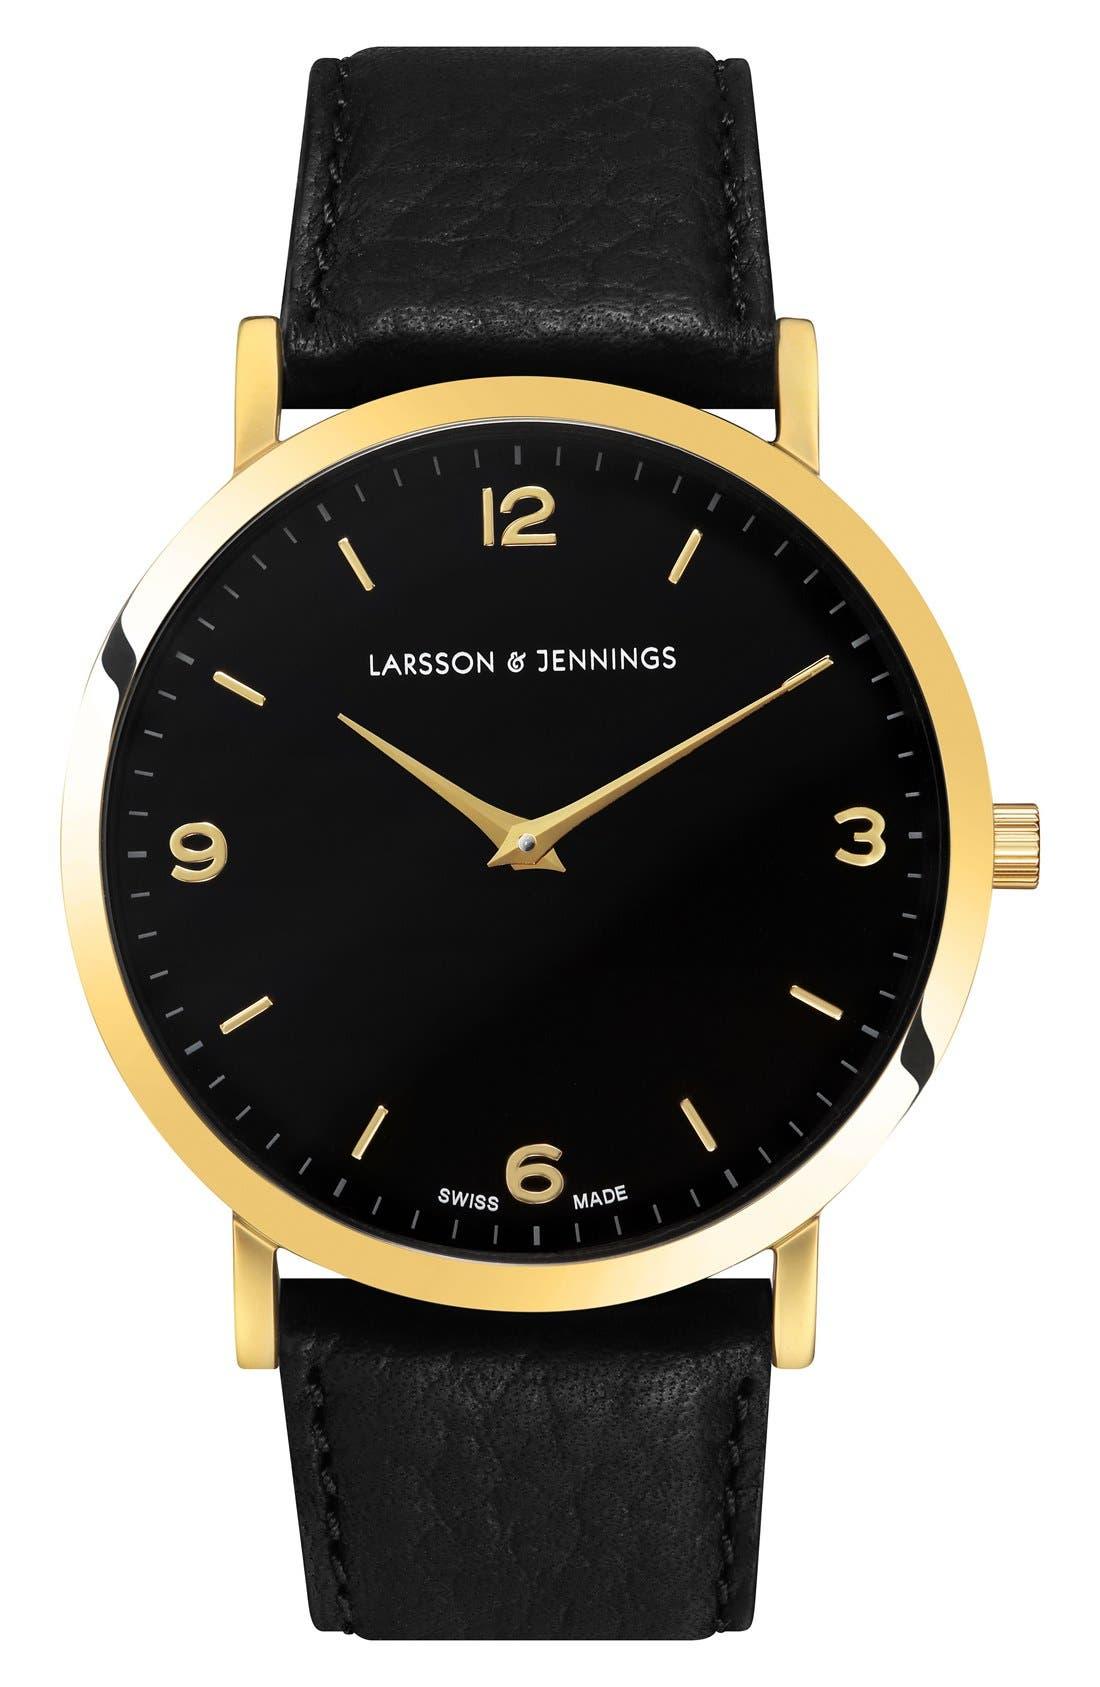 Larsson & Jennings Lugano Leather Strap Watch, 38mm